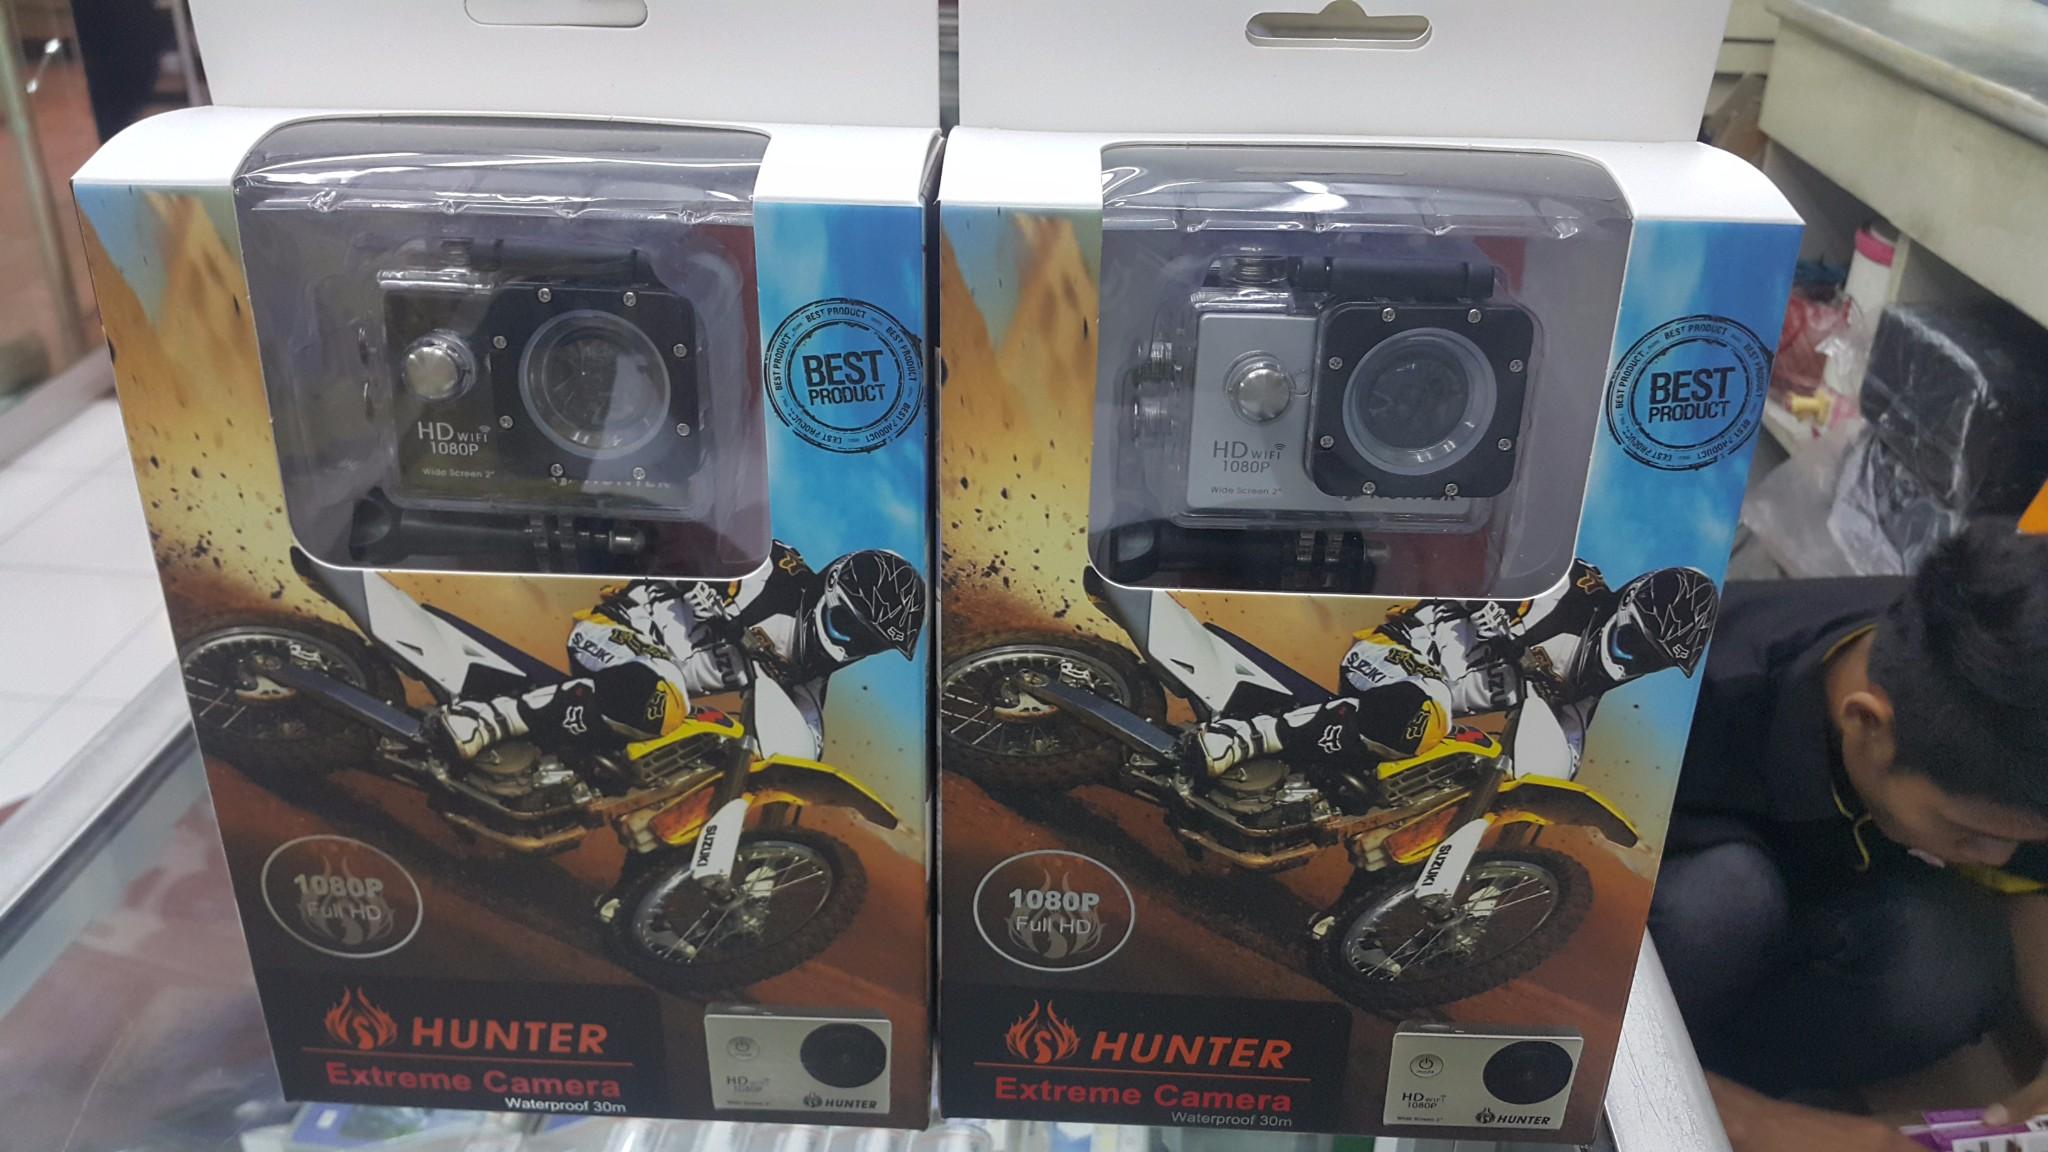 Jual Murah Hunter Extreme Camera Update 2018 Lee Cooper Lc37gd Jam Tangan Pria Cokelat Action Camera12mpwifigaransi 1thfree Monopod Mmc 8gb Astra Foto Tokopedia